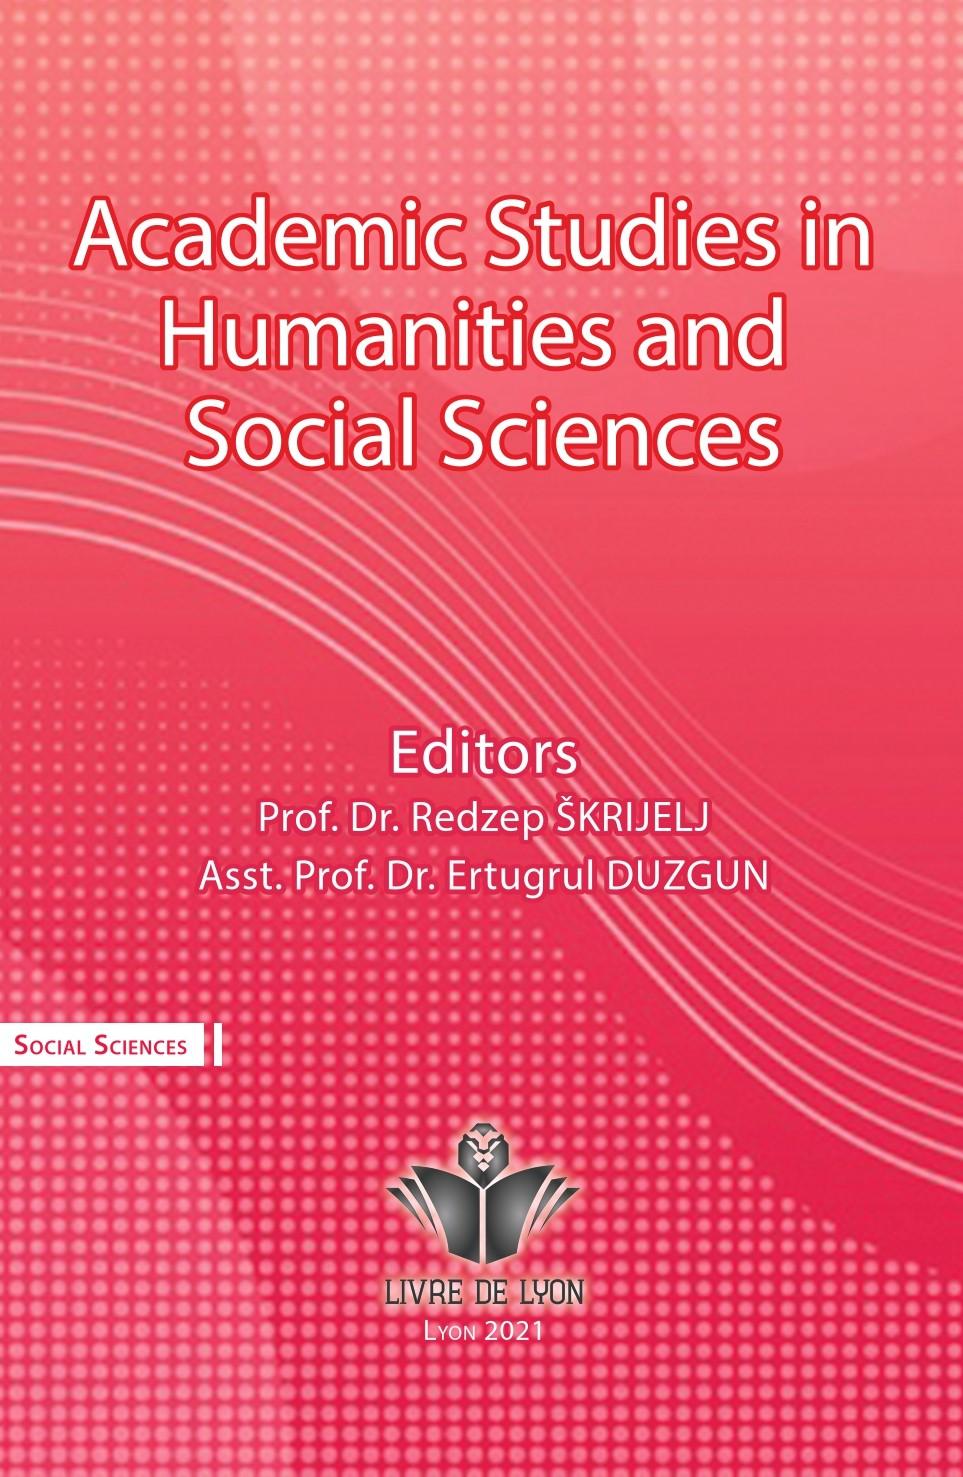 Academic Studies in Humanities and Social Sciences